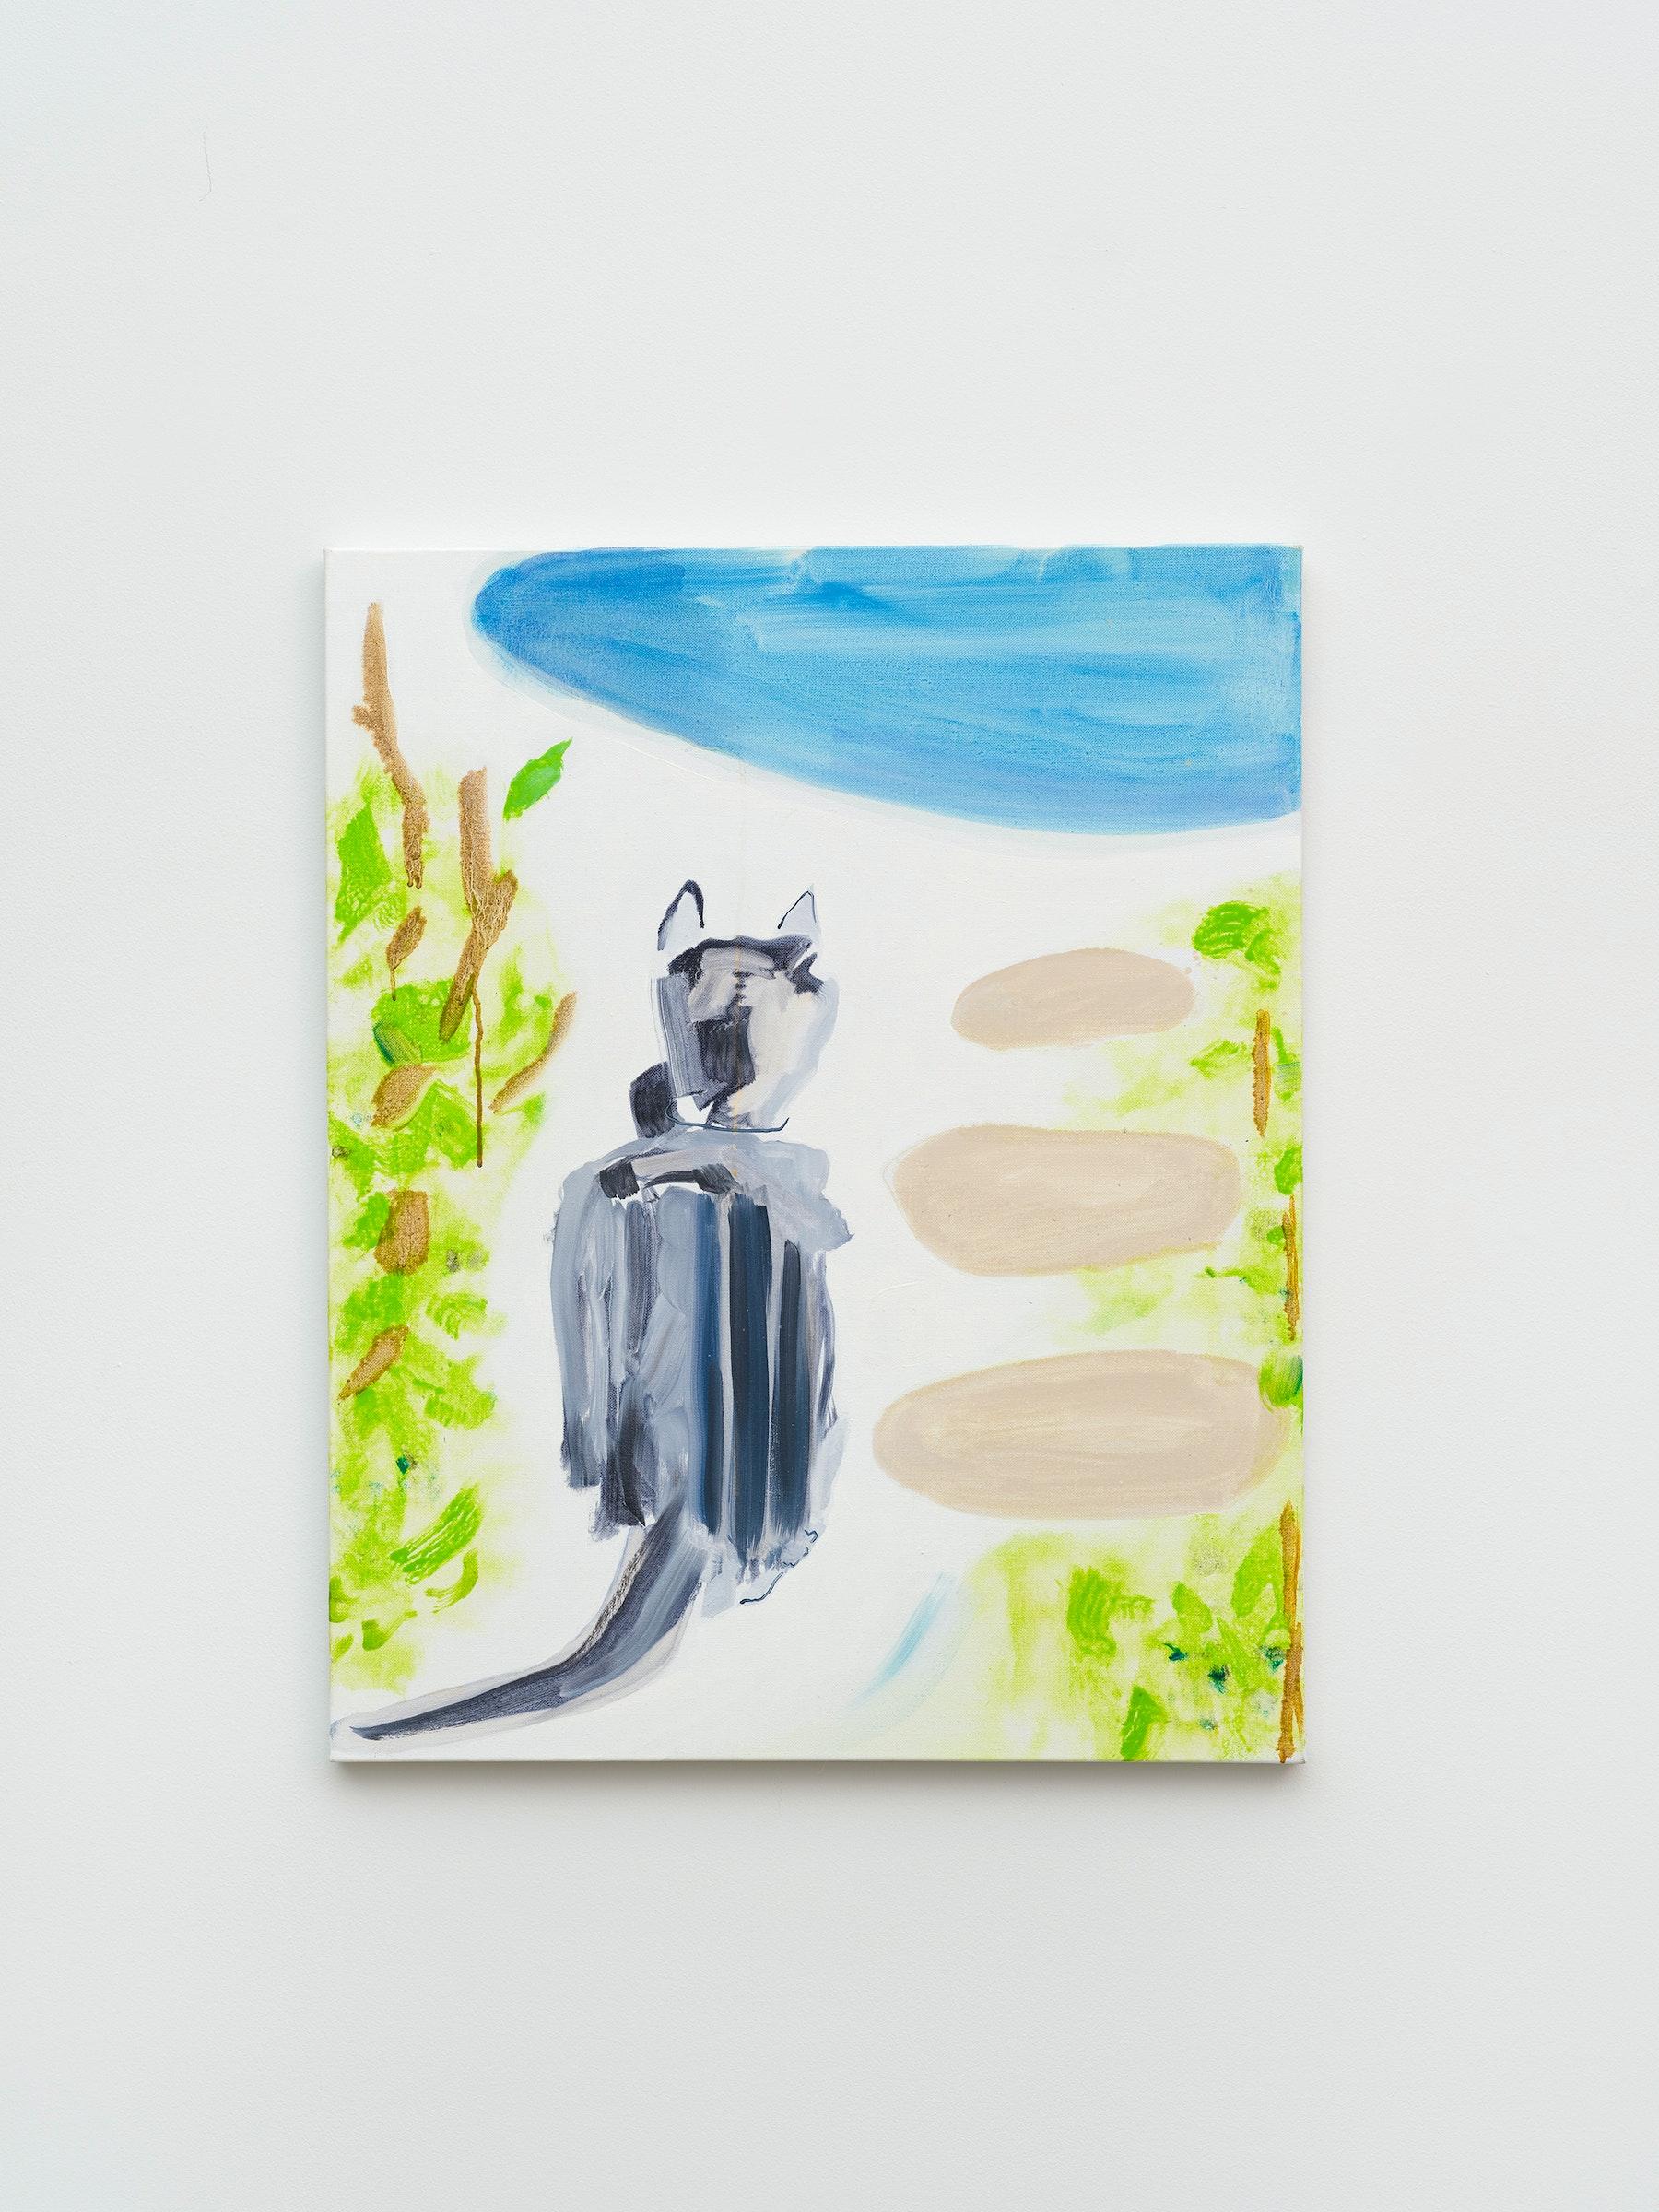 "Monique Van Genderen ""Lou Looking,"" 2018 Oil on linen 18"" x 14 ¹⁄₄"" [HxW] (45.72 x 36.2 cm) Inventory #VGE417 Courtesy of the artist and Vielmetter Los Angeles Photo credit: Jeff McLane"